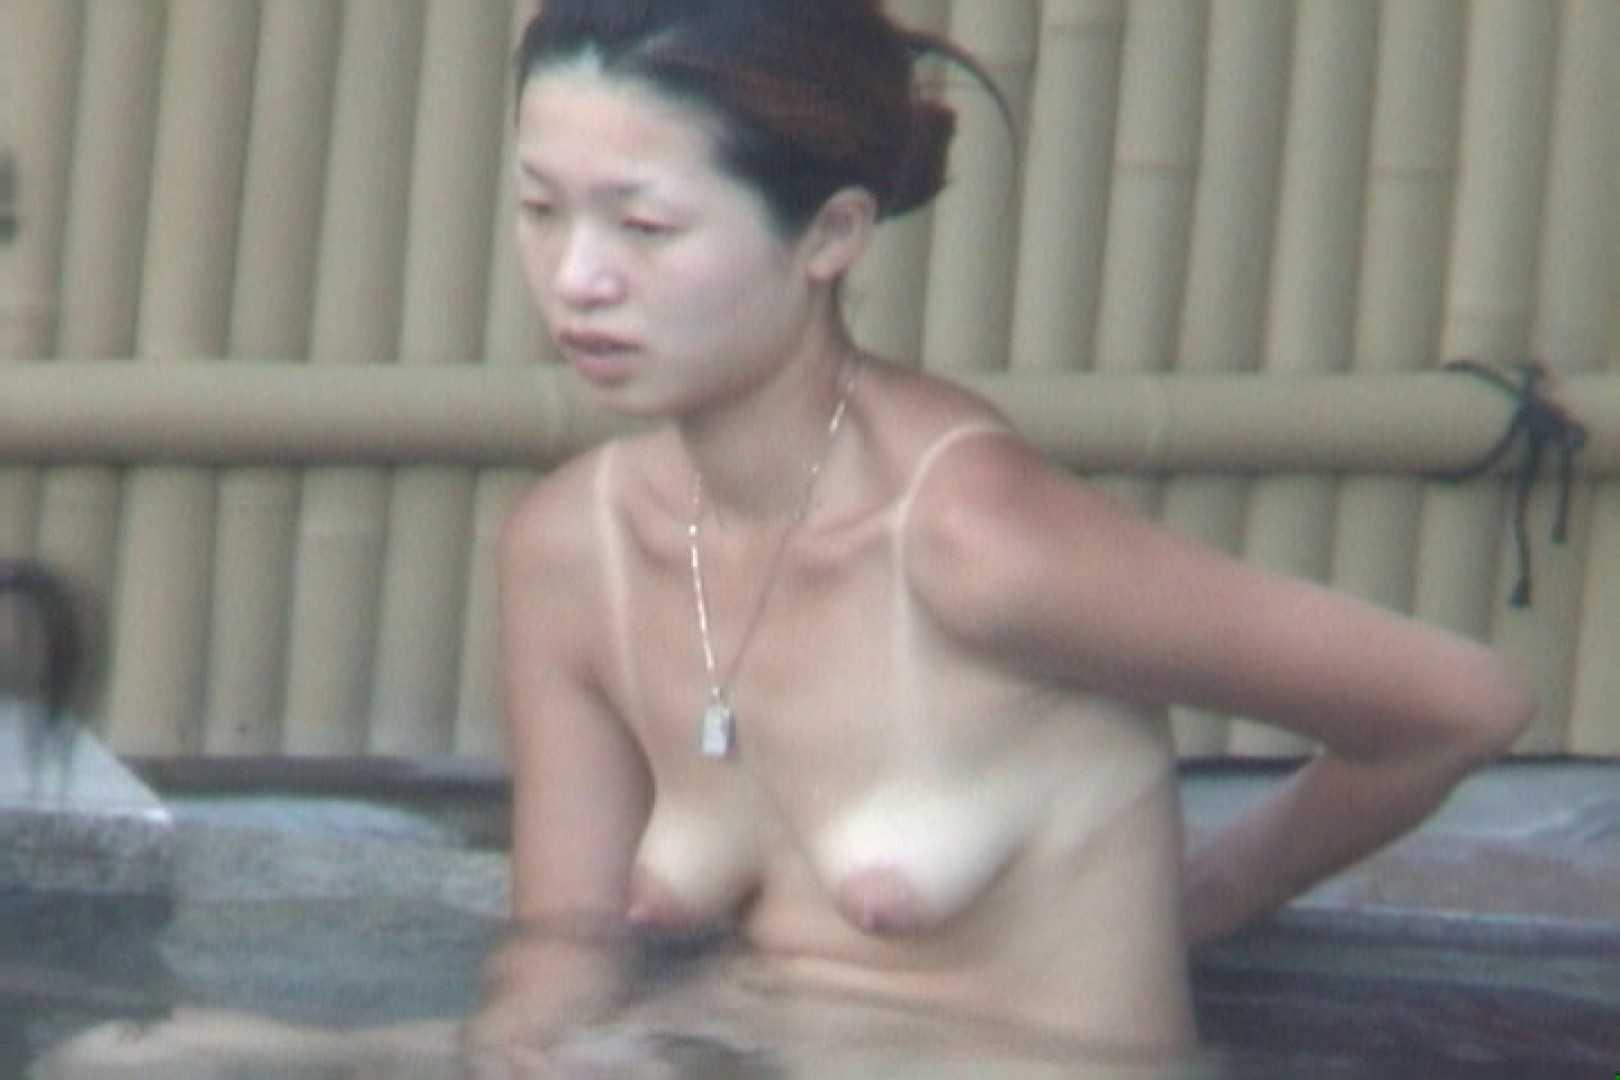 Aquaな露天風呂Vol.571 盗撮 | OLセックス  83画像 79